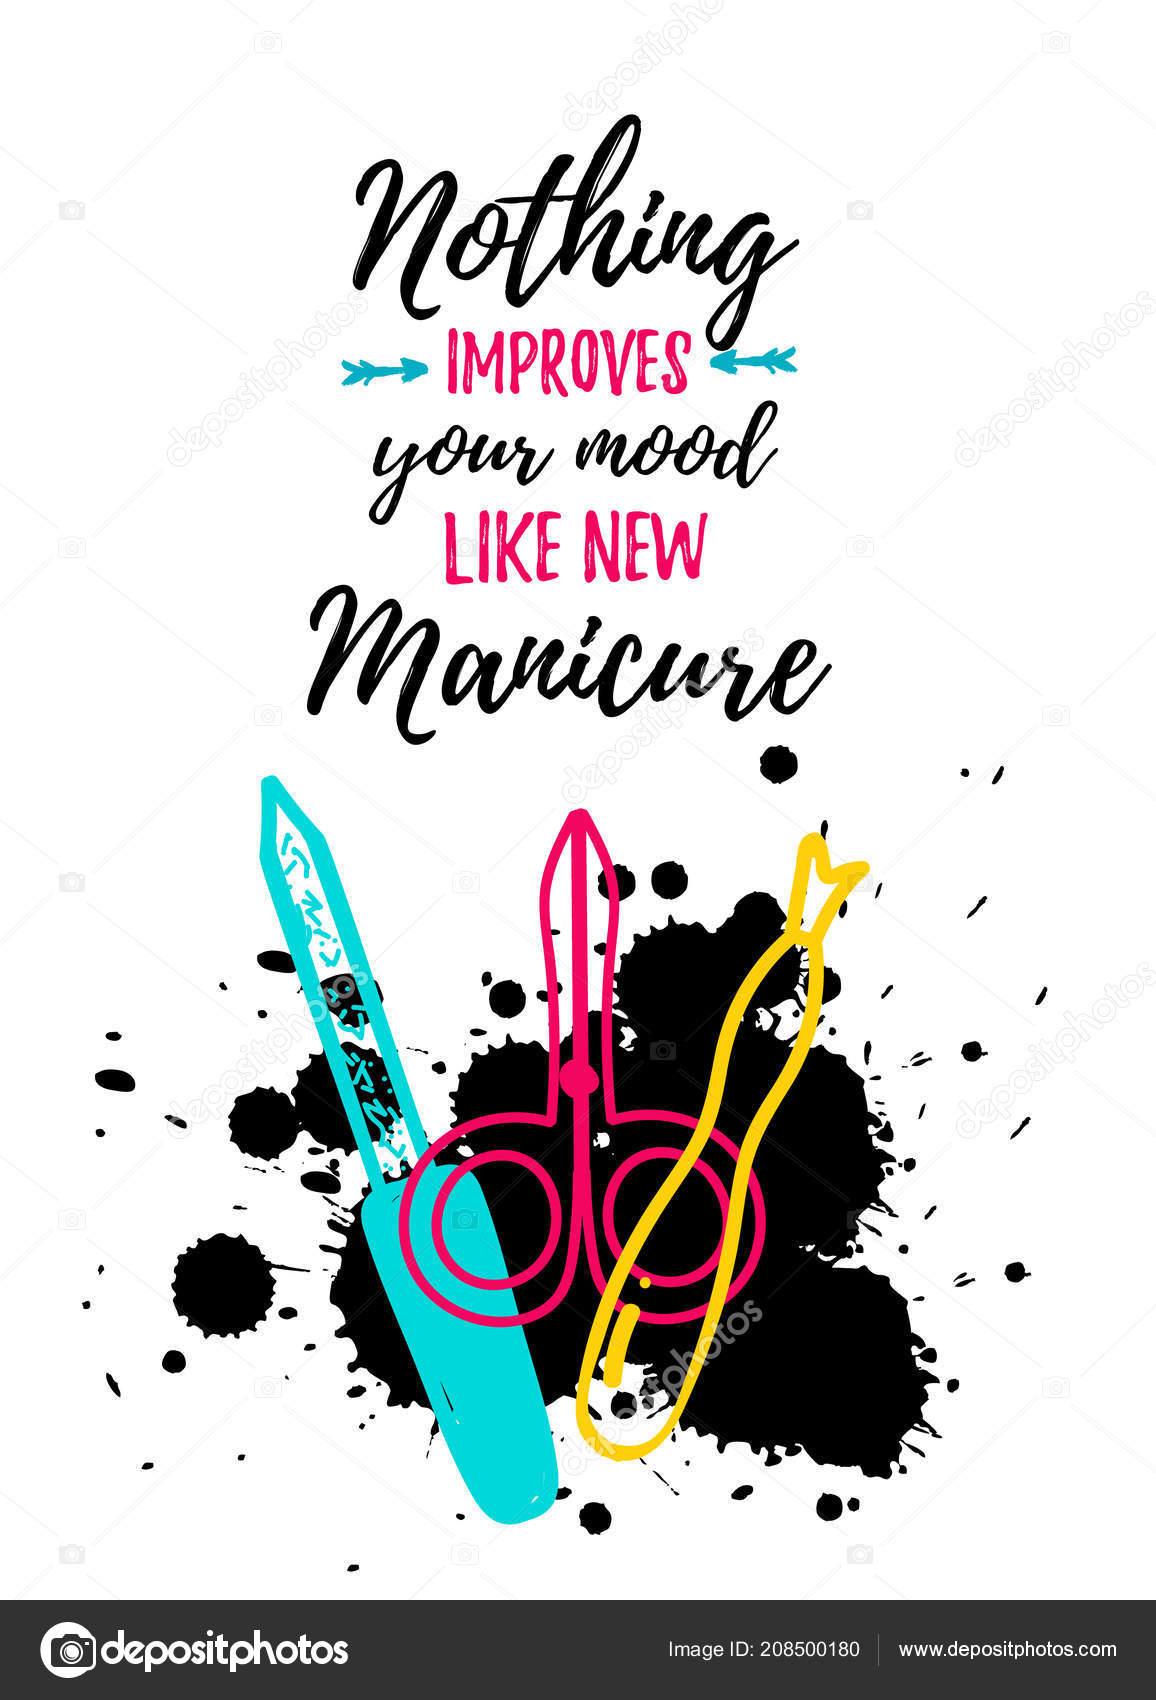 https depositphotos com 208500180 stock illustration manicure poster modern colorful style html